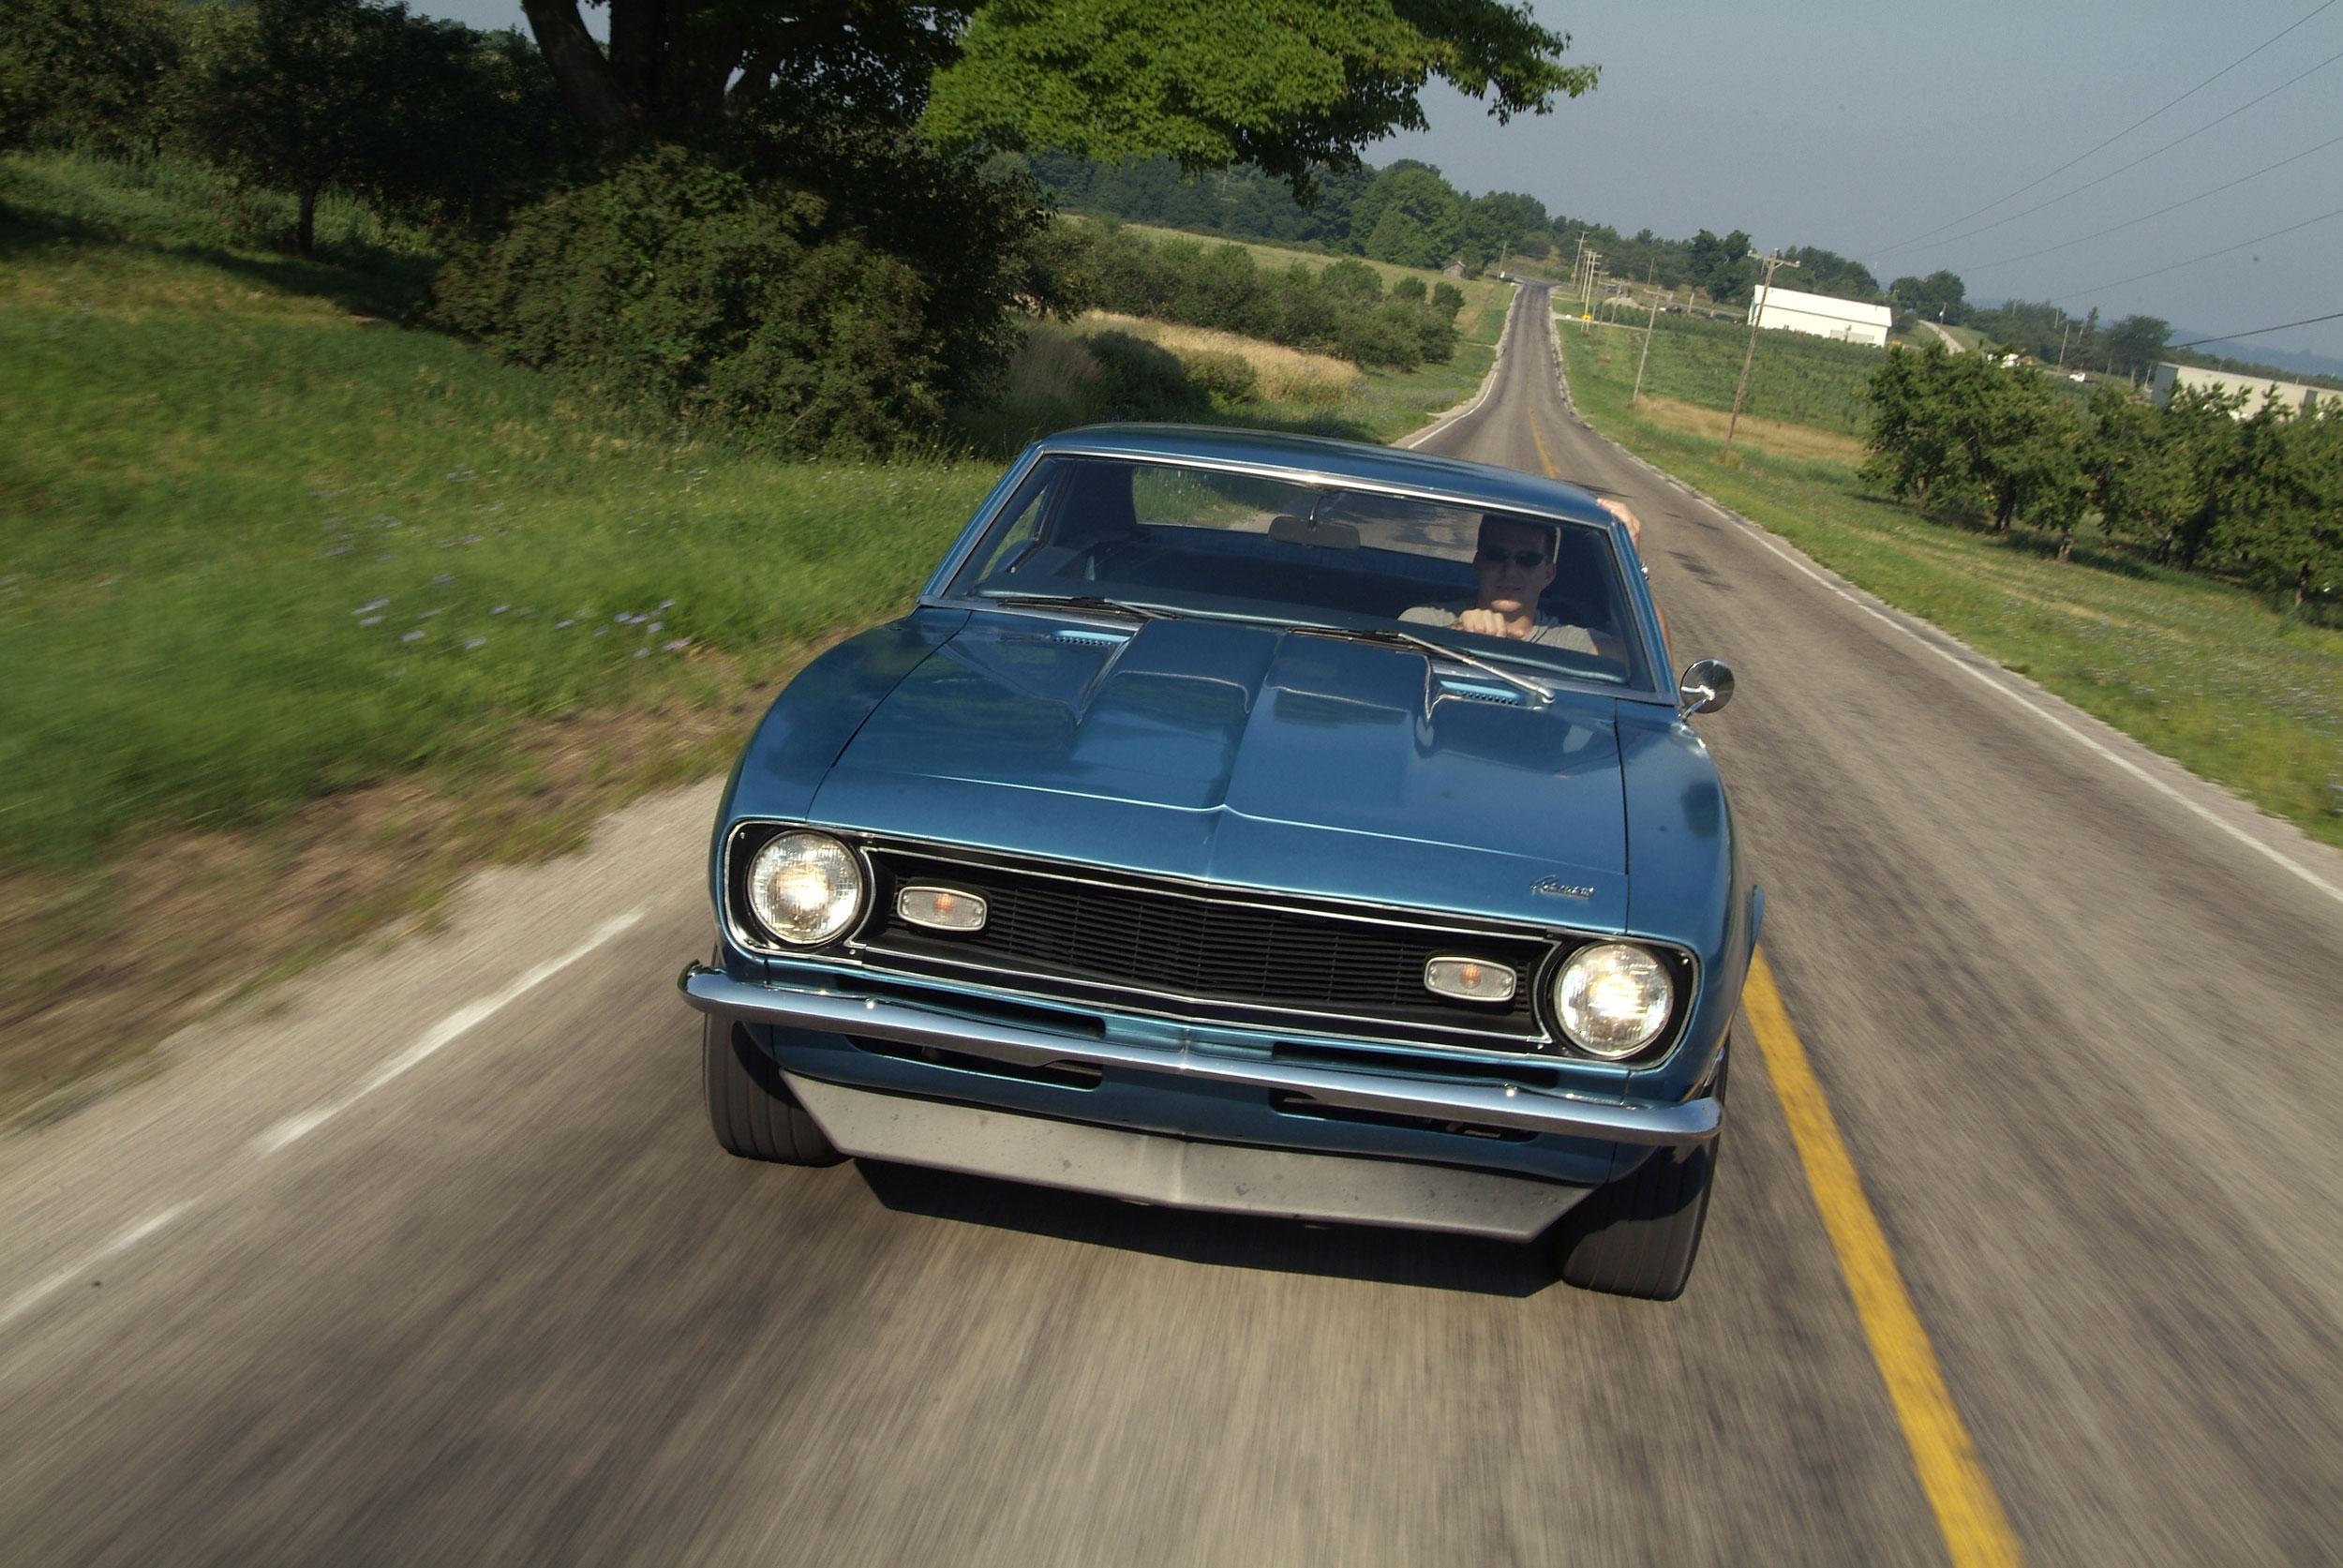 1968 Chevrolet Camaro driving